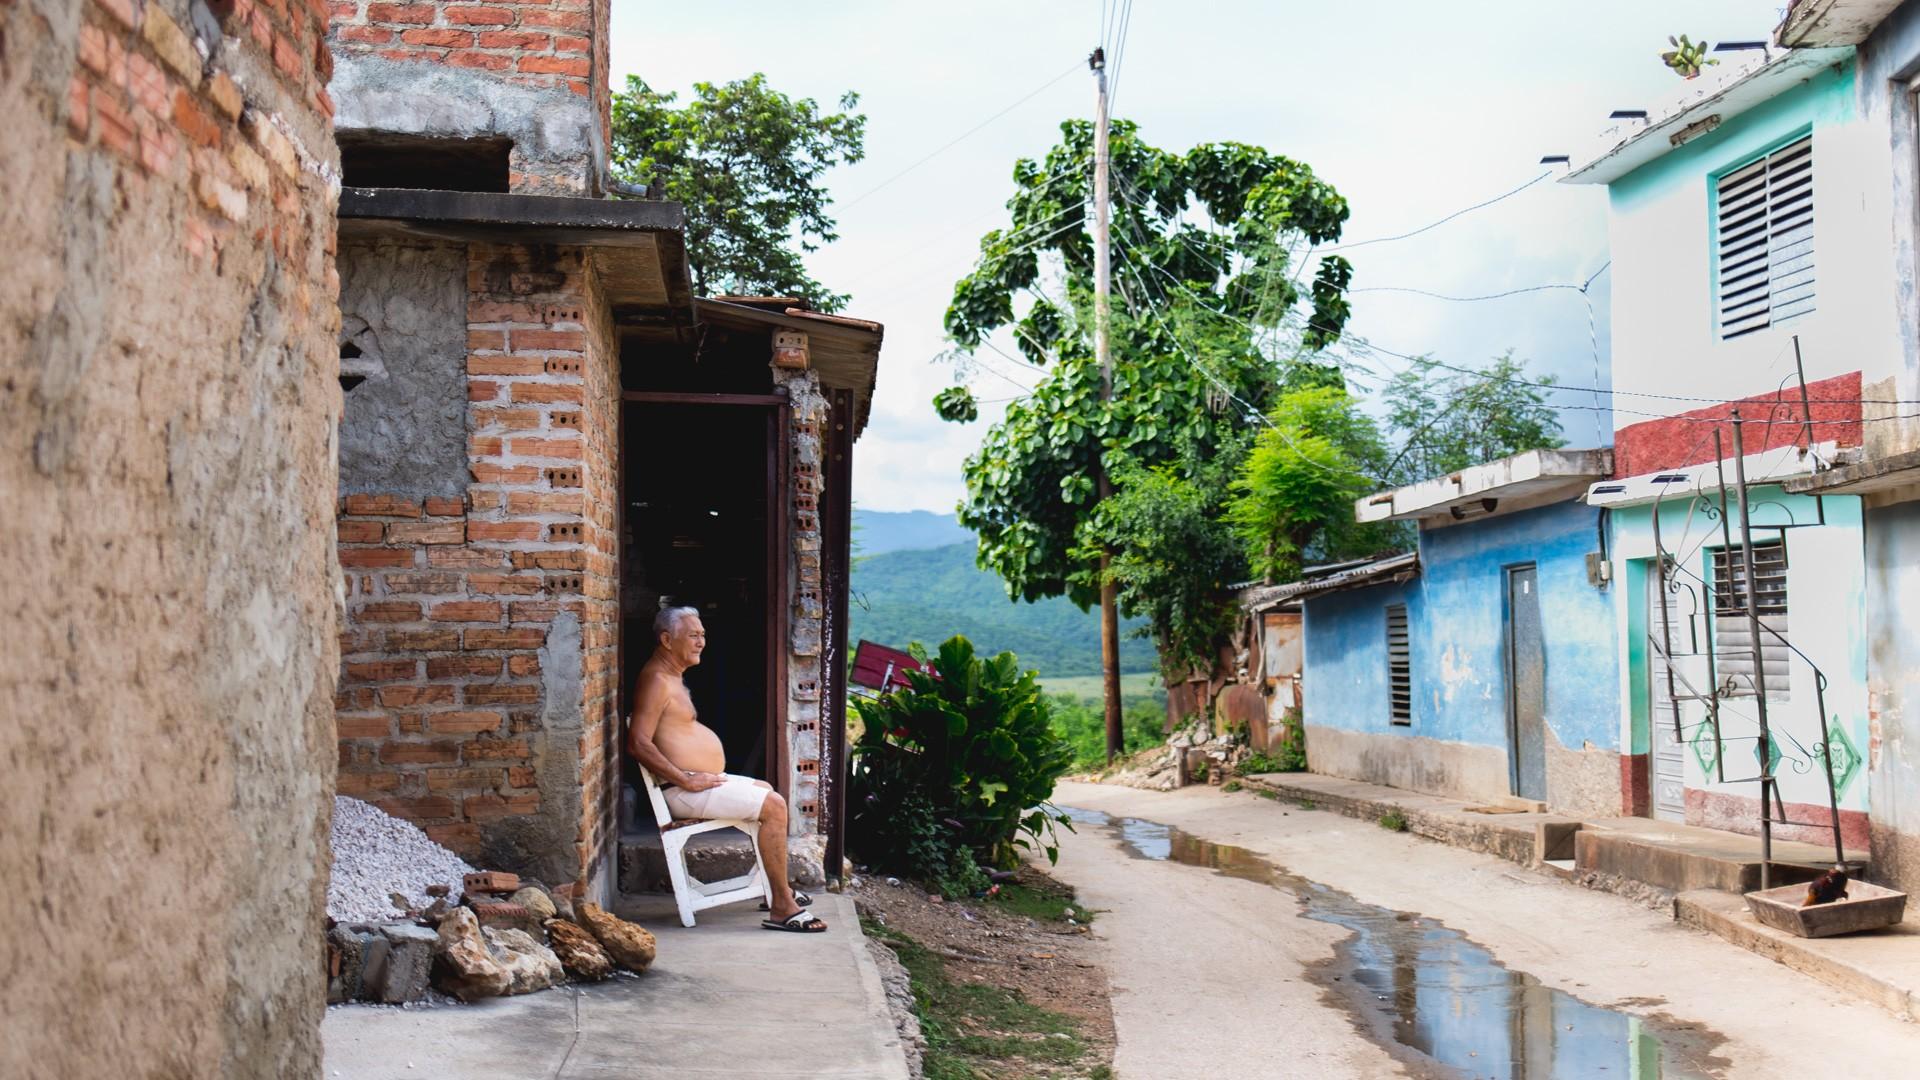 Damien-Dohmen-Photographe-Cuba-35